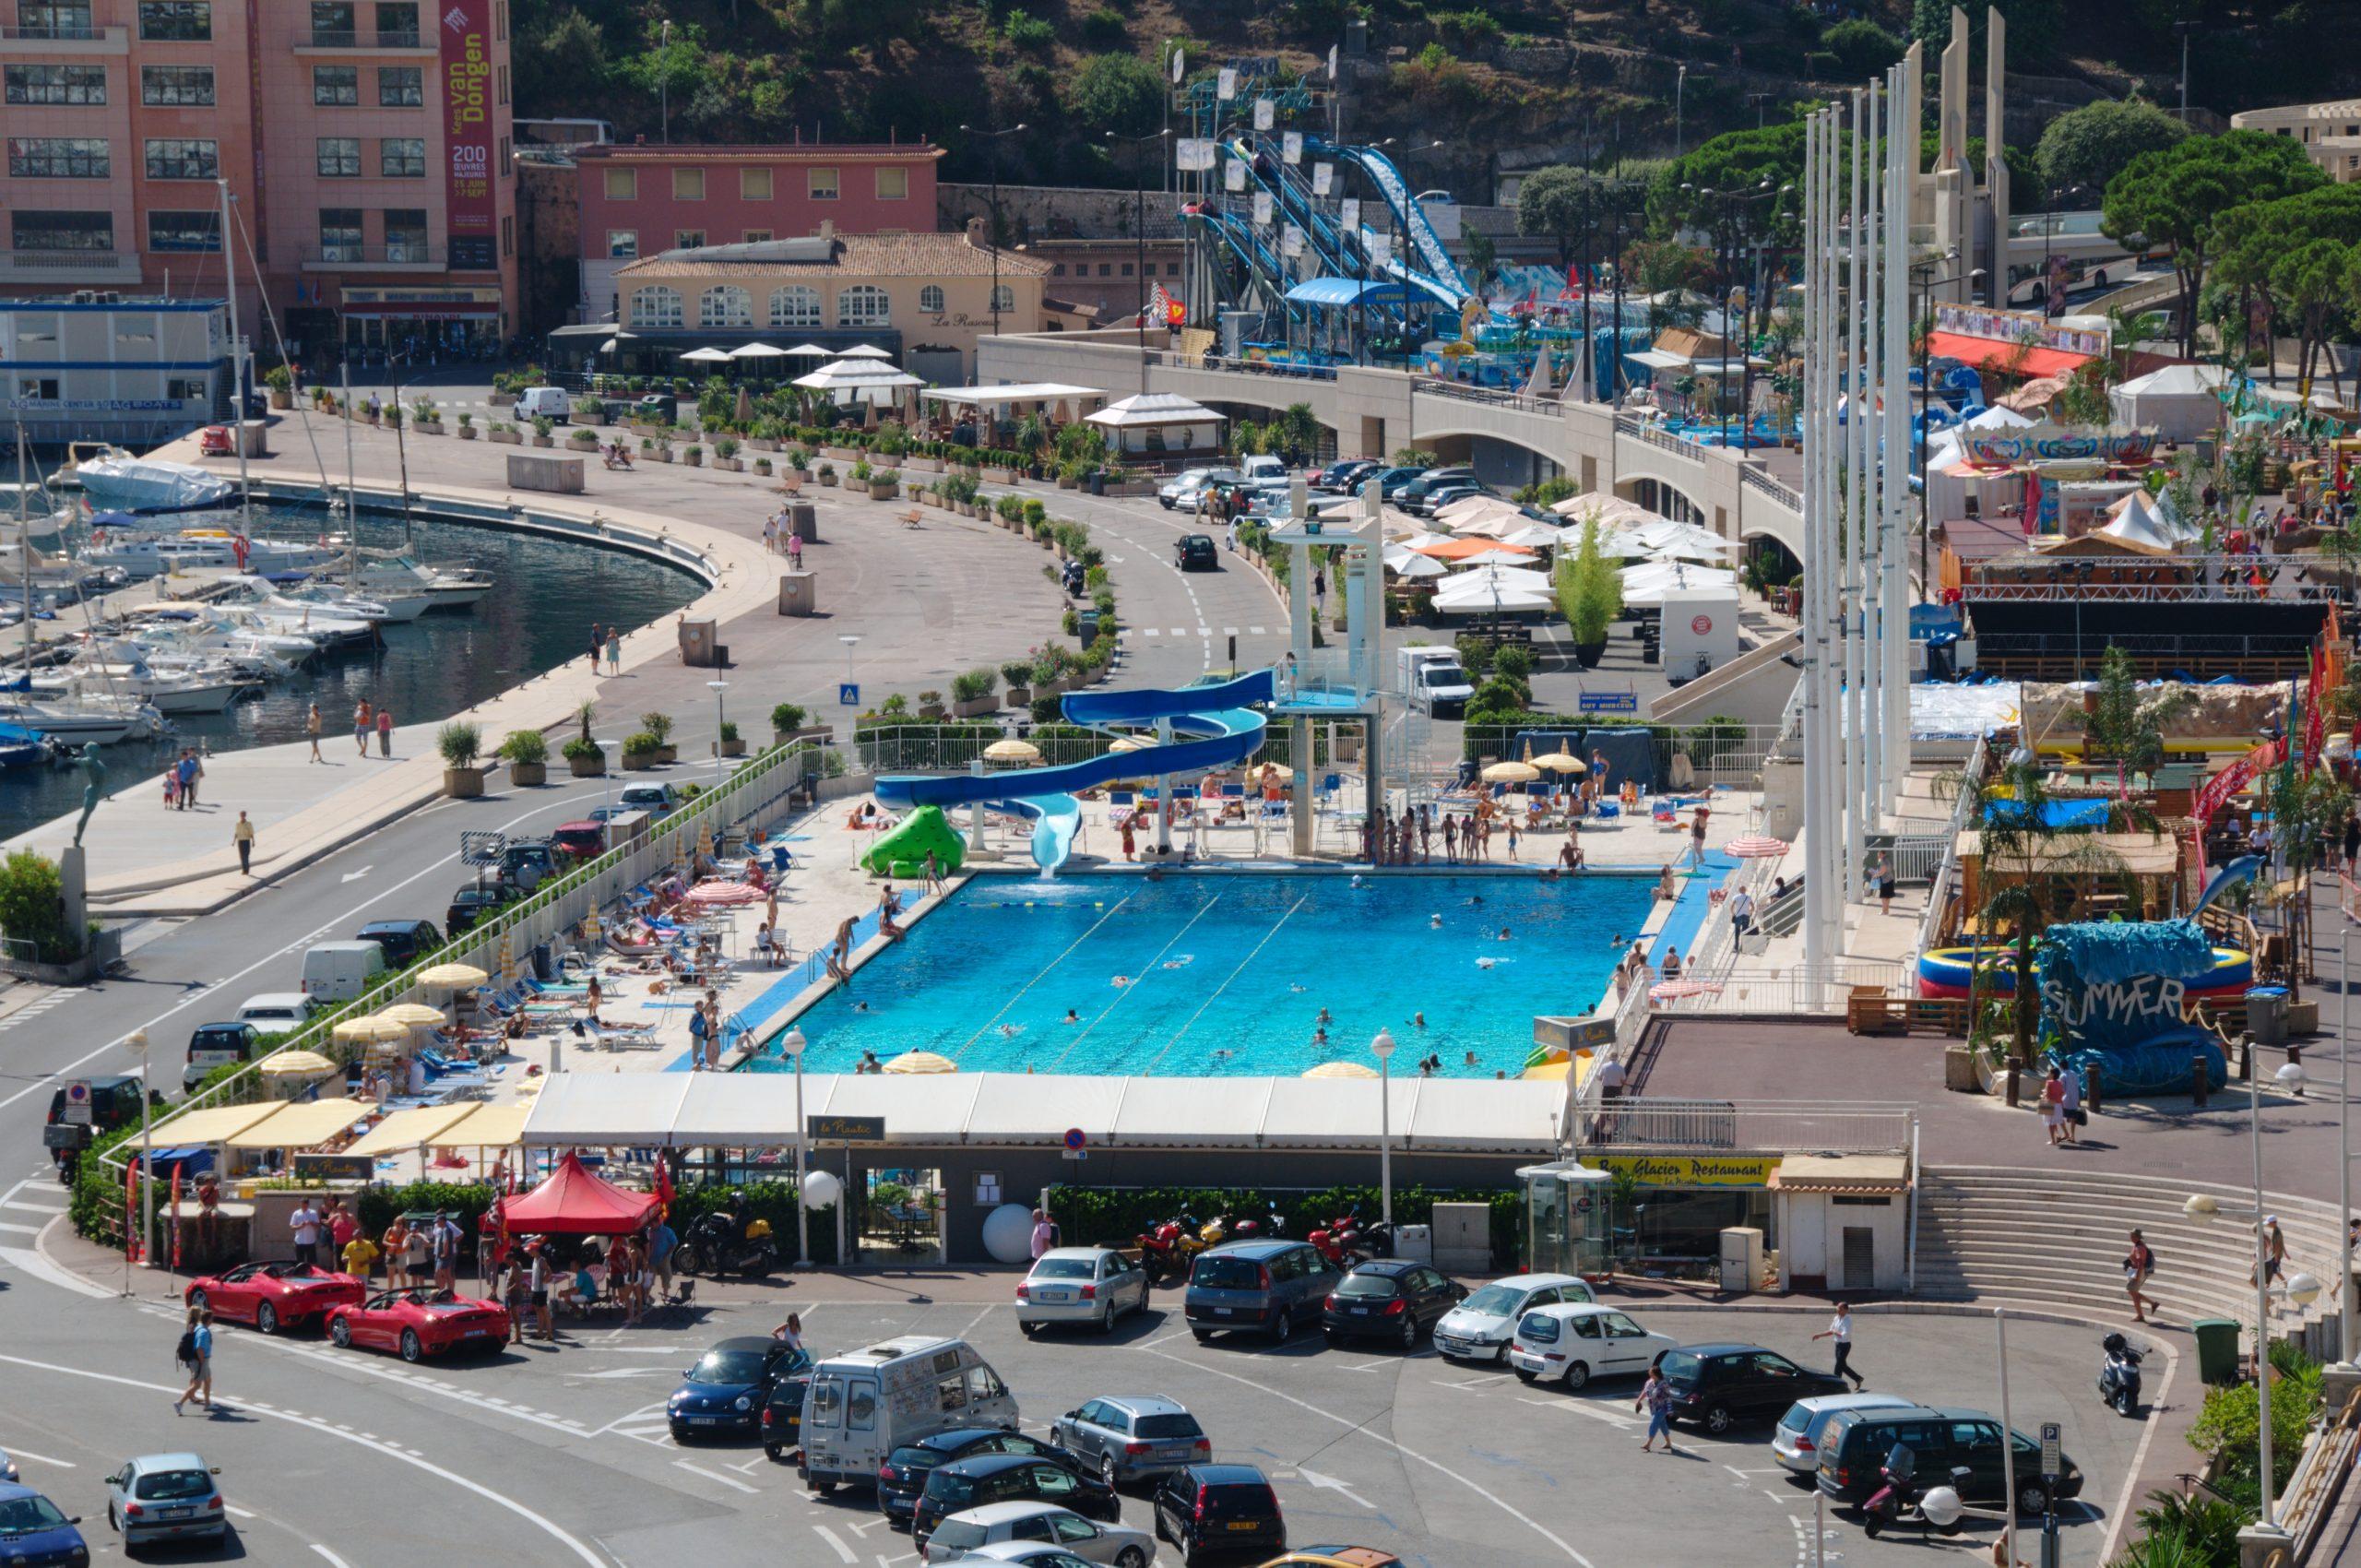 File:piscine De Monaco.jpg - Wikimedia Commons concernant Piscine Originale